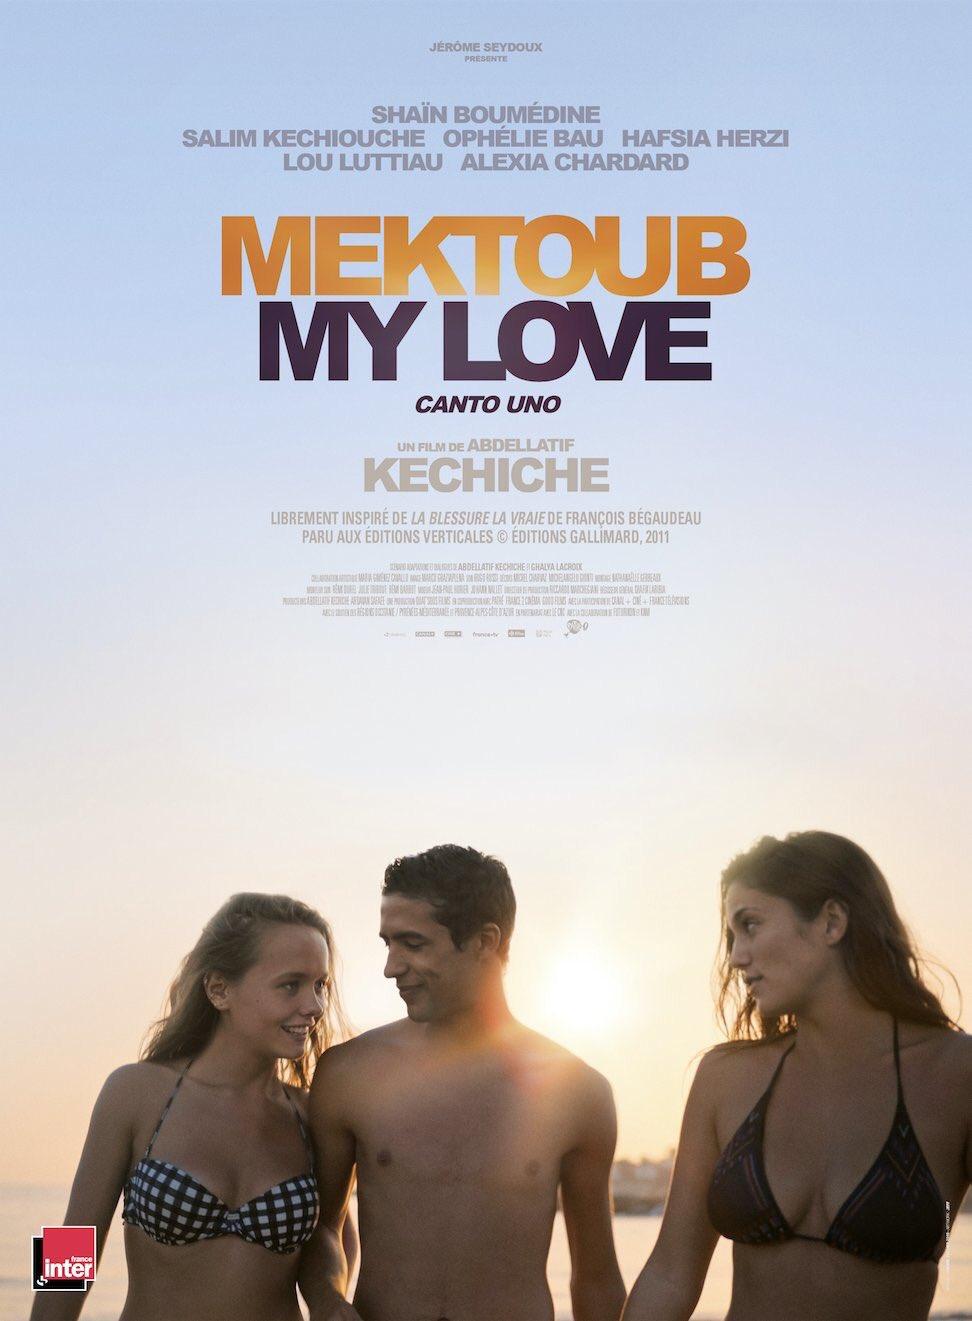 Mektoub, My Love - Canto uno 02